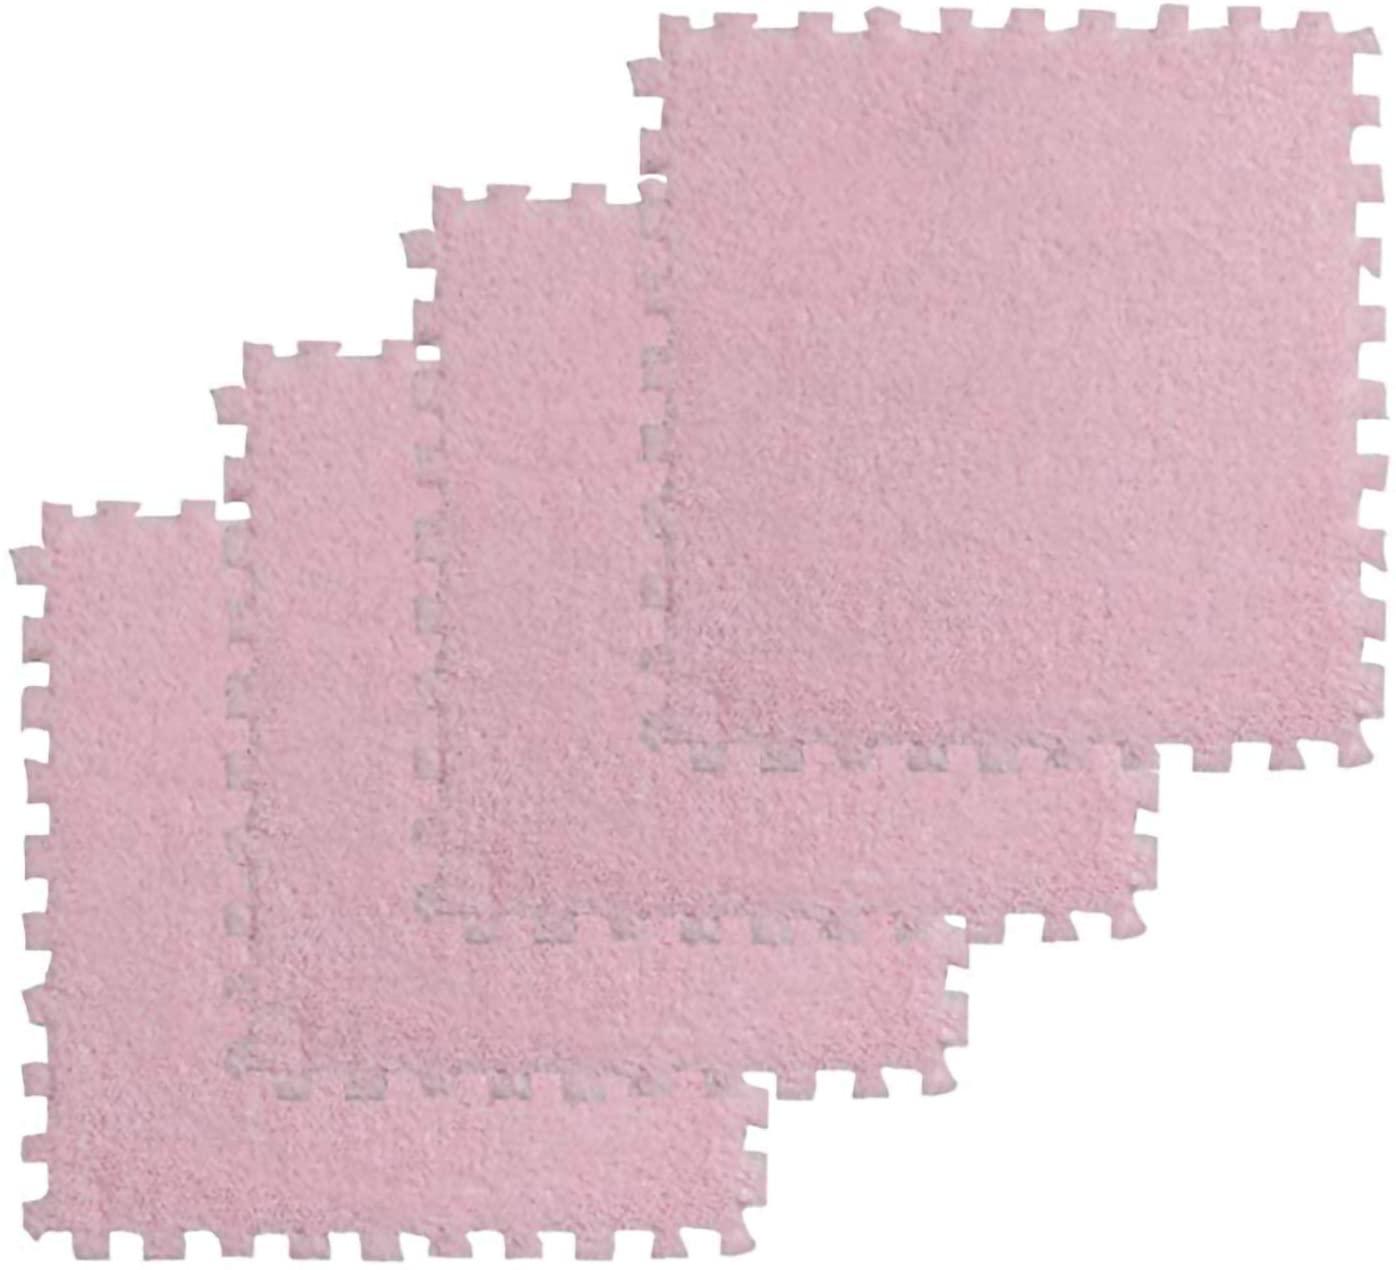 Eanpet Puzzle Mat Shag Area Rug Foam Interlocking Floor Mats for Living Room Bedroom Nursery Playroom Home Decor - Boys Girls Crawling Pad Fluffy Pets Carpet (12pcs, 2', Pink)